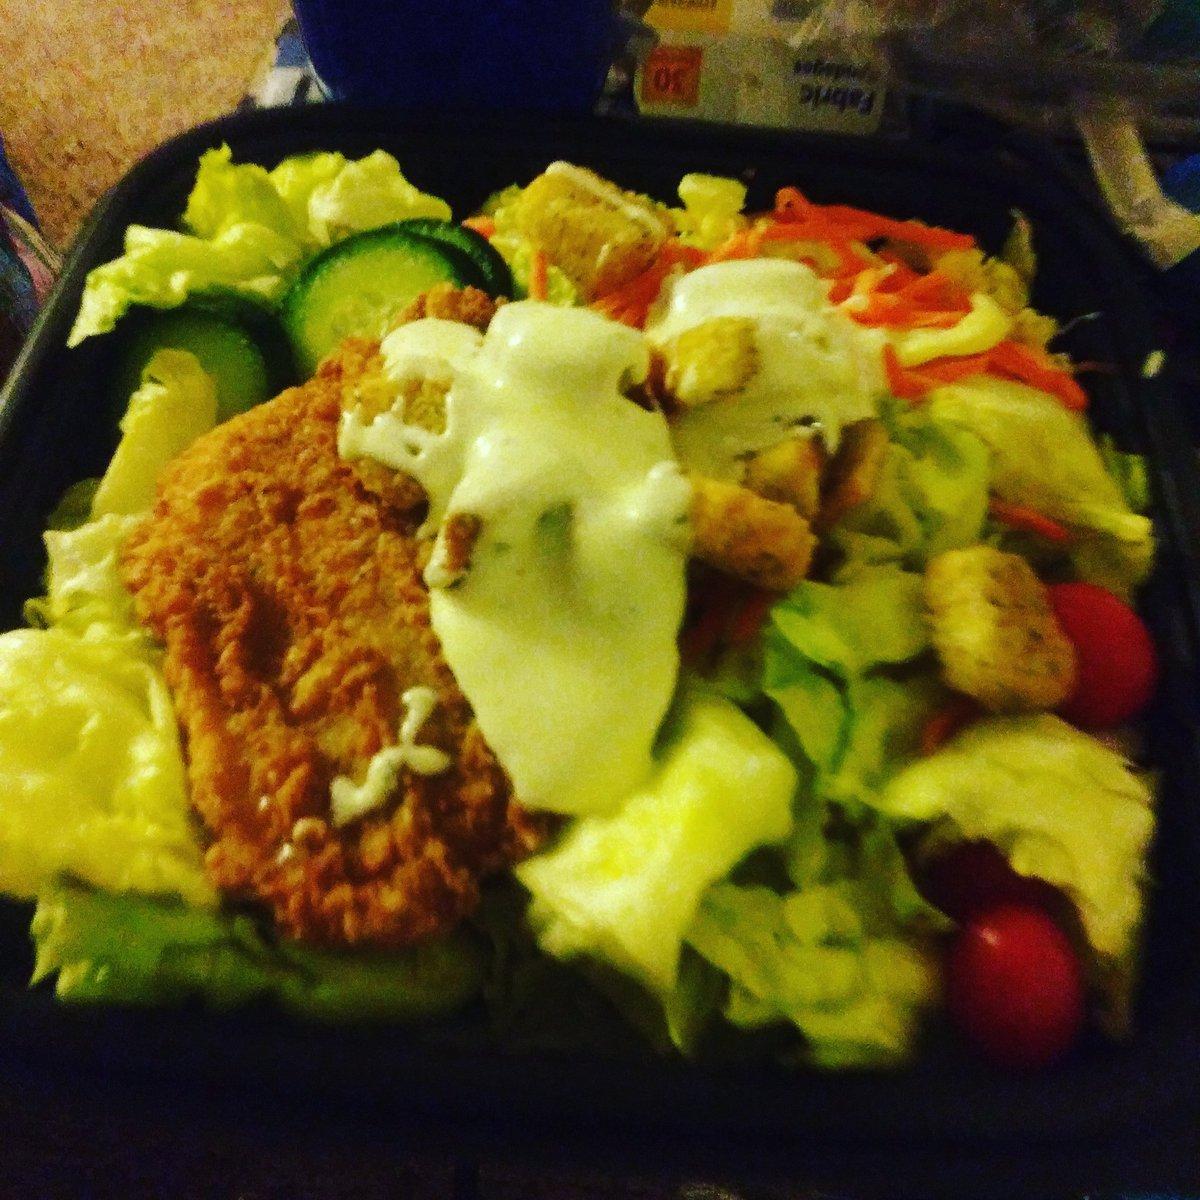 #healthyfood #gettingfit pic.twitter.com/sL9qr2smPc